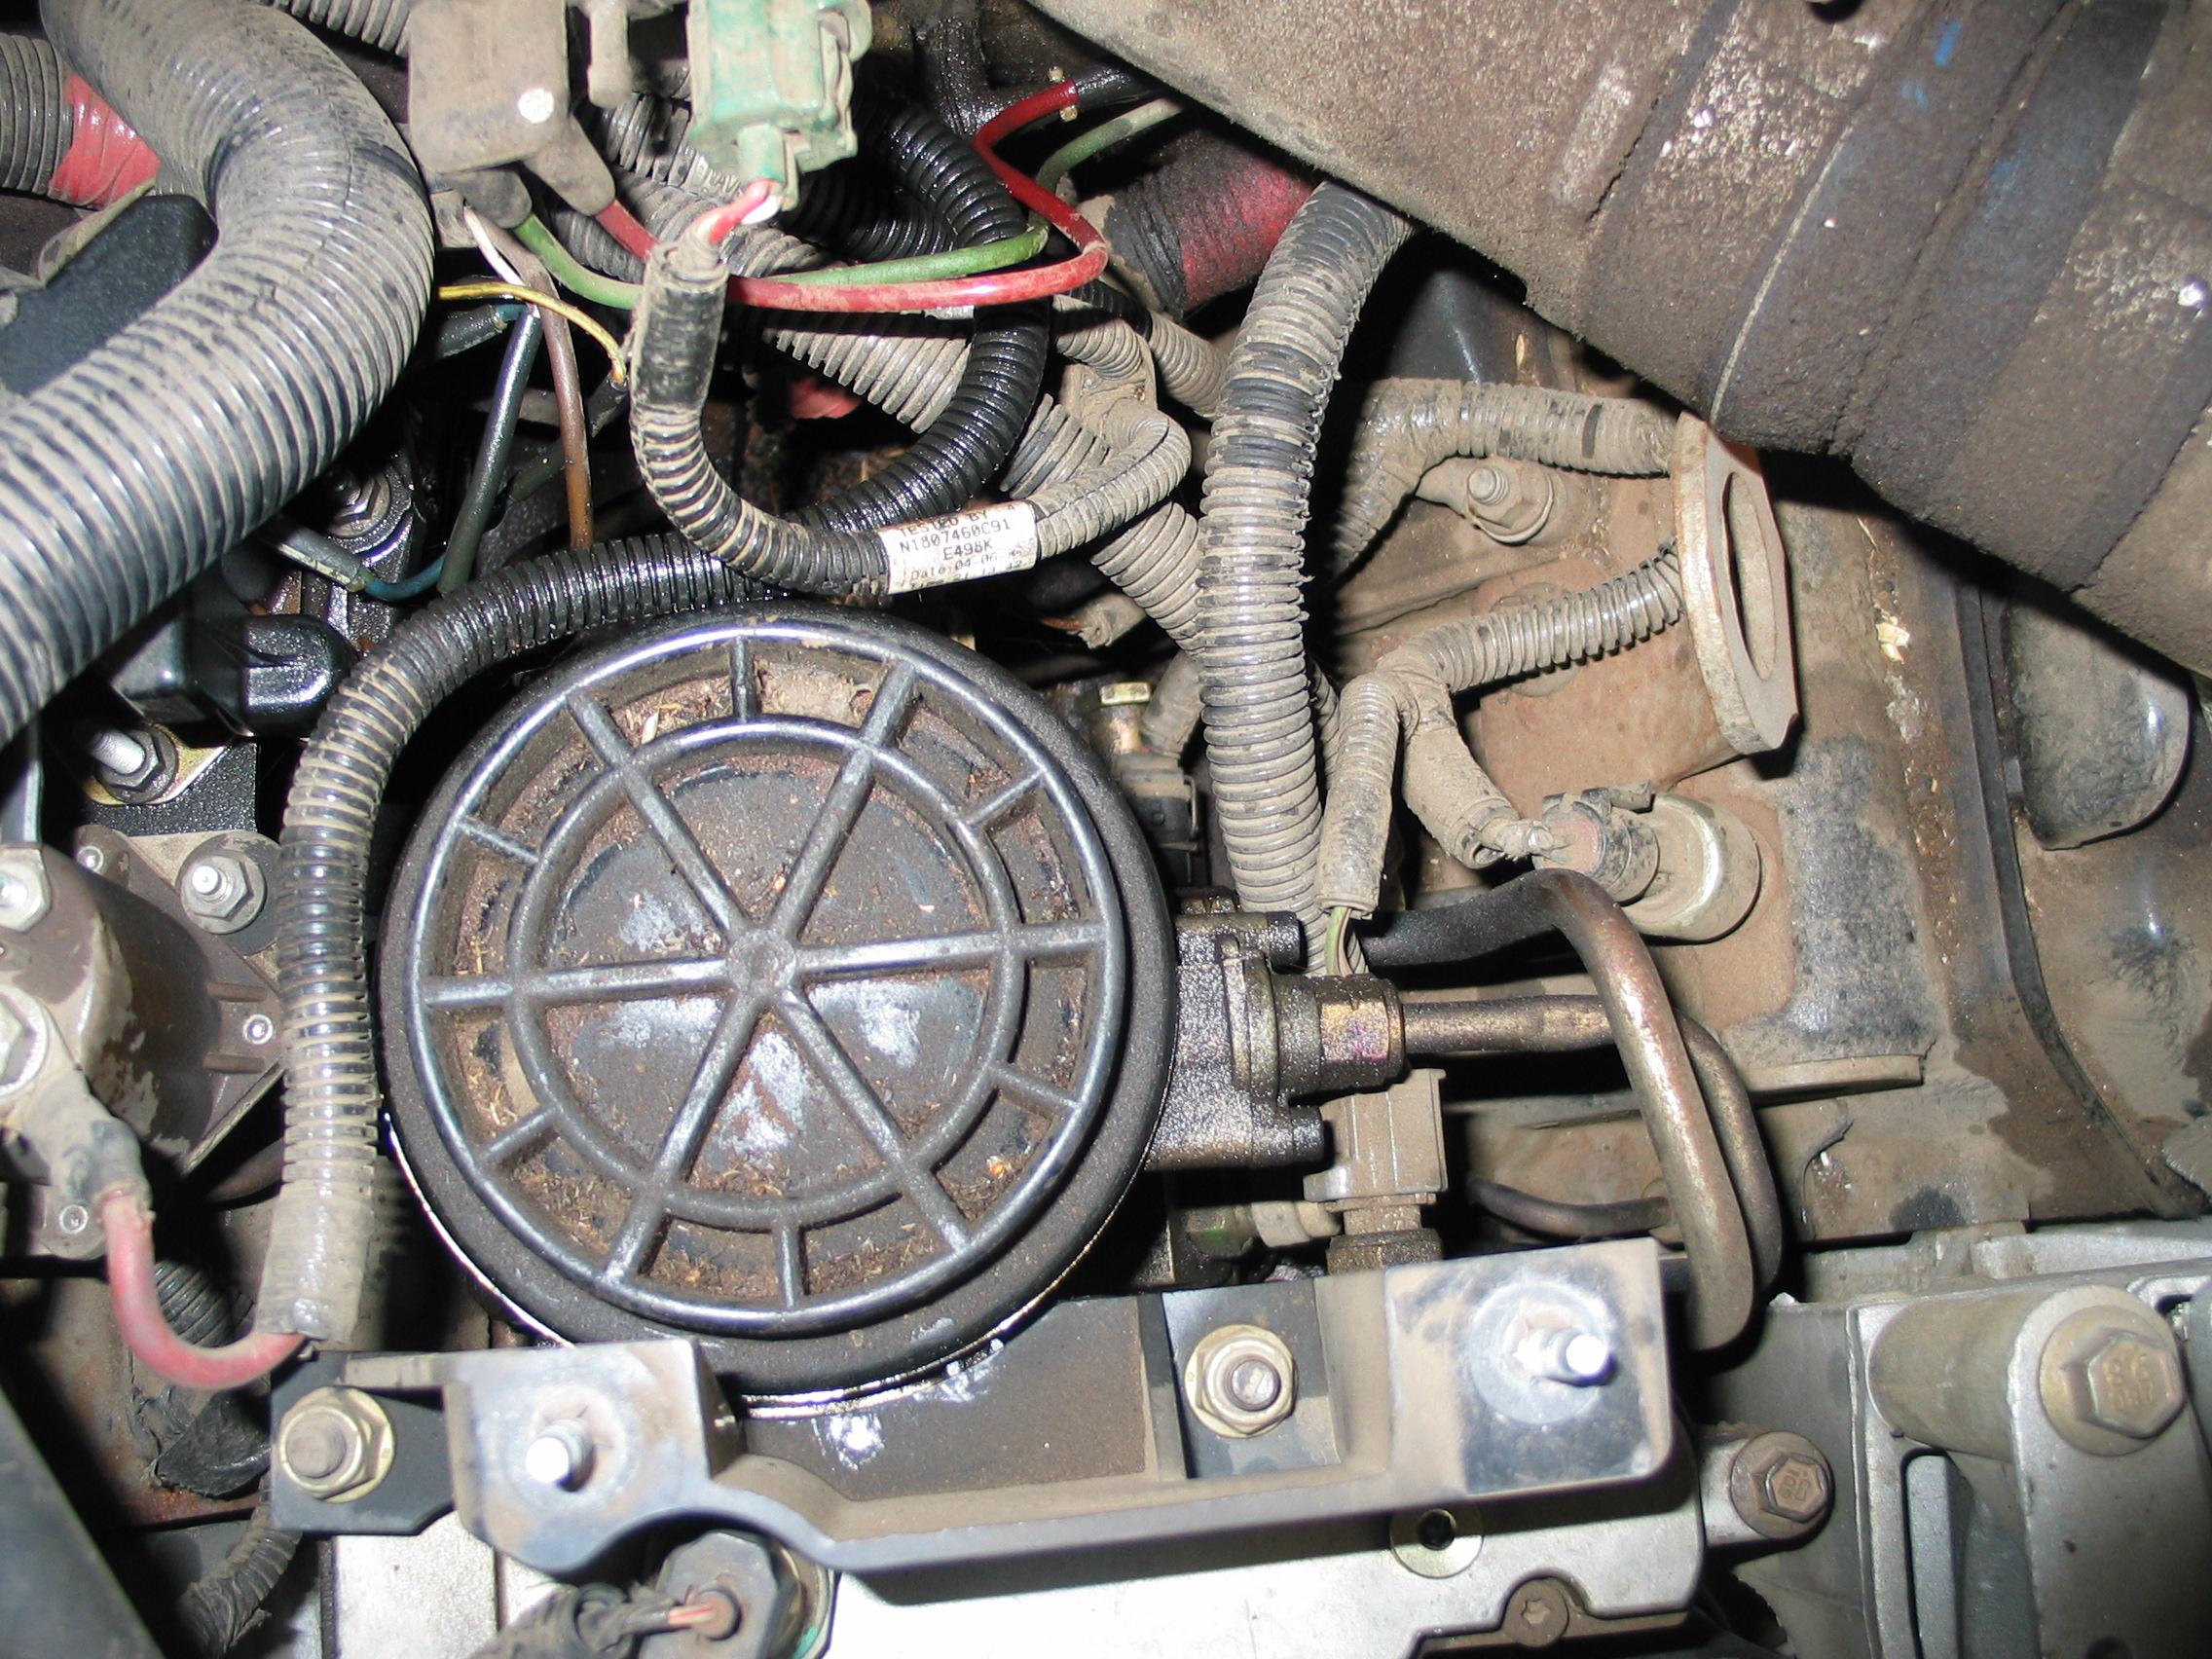 7 3 powerstroke engine wiring diagram digital amp meter diesel harness schematic library